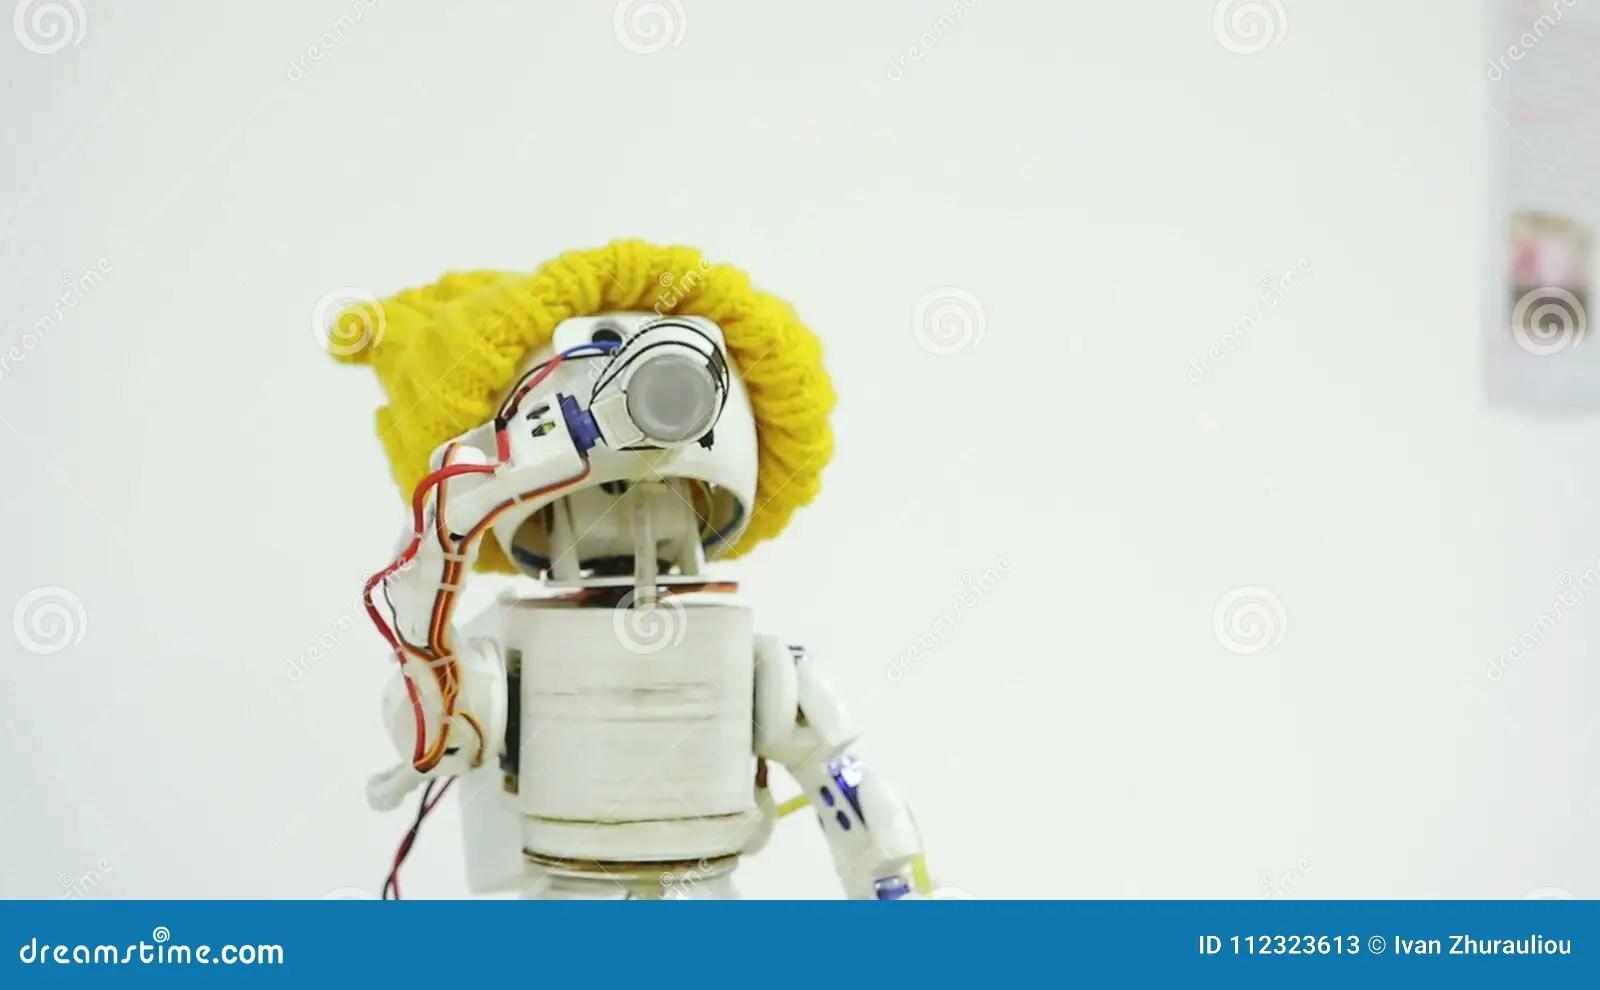 robot drinks alcohol